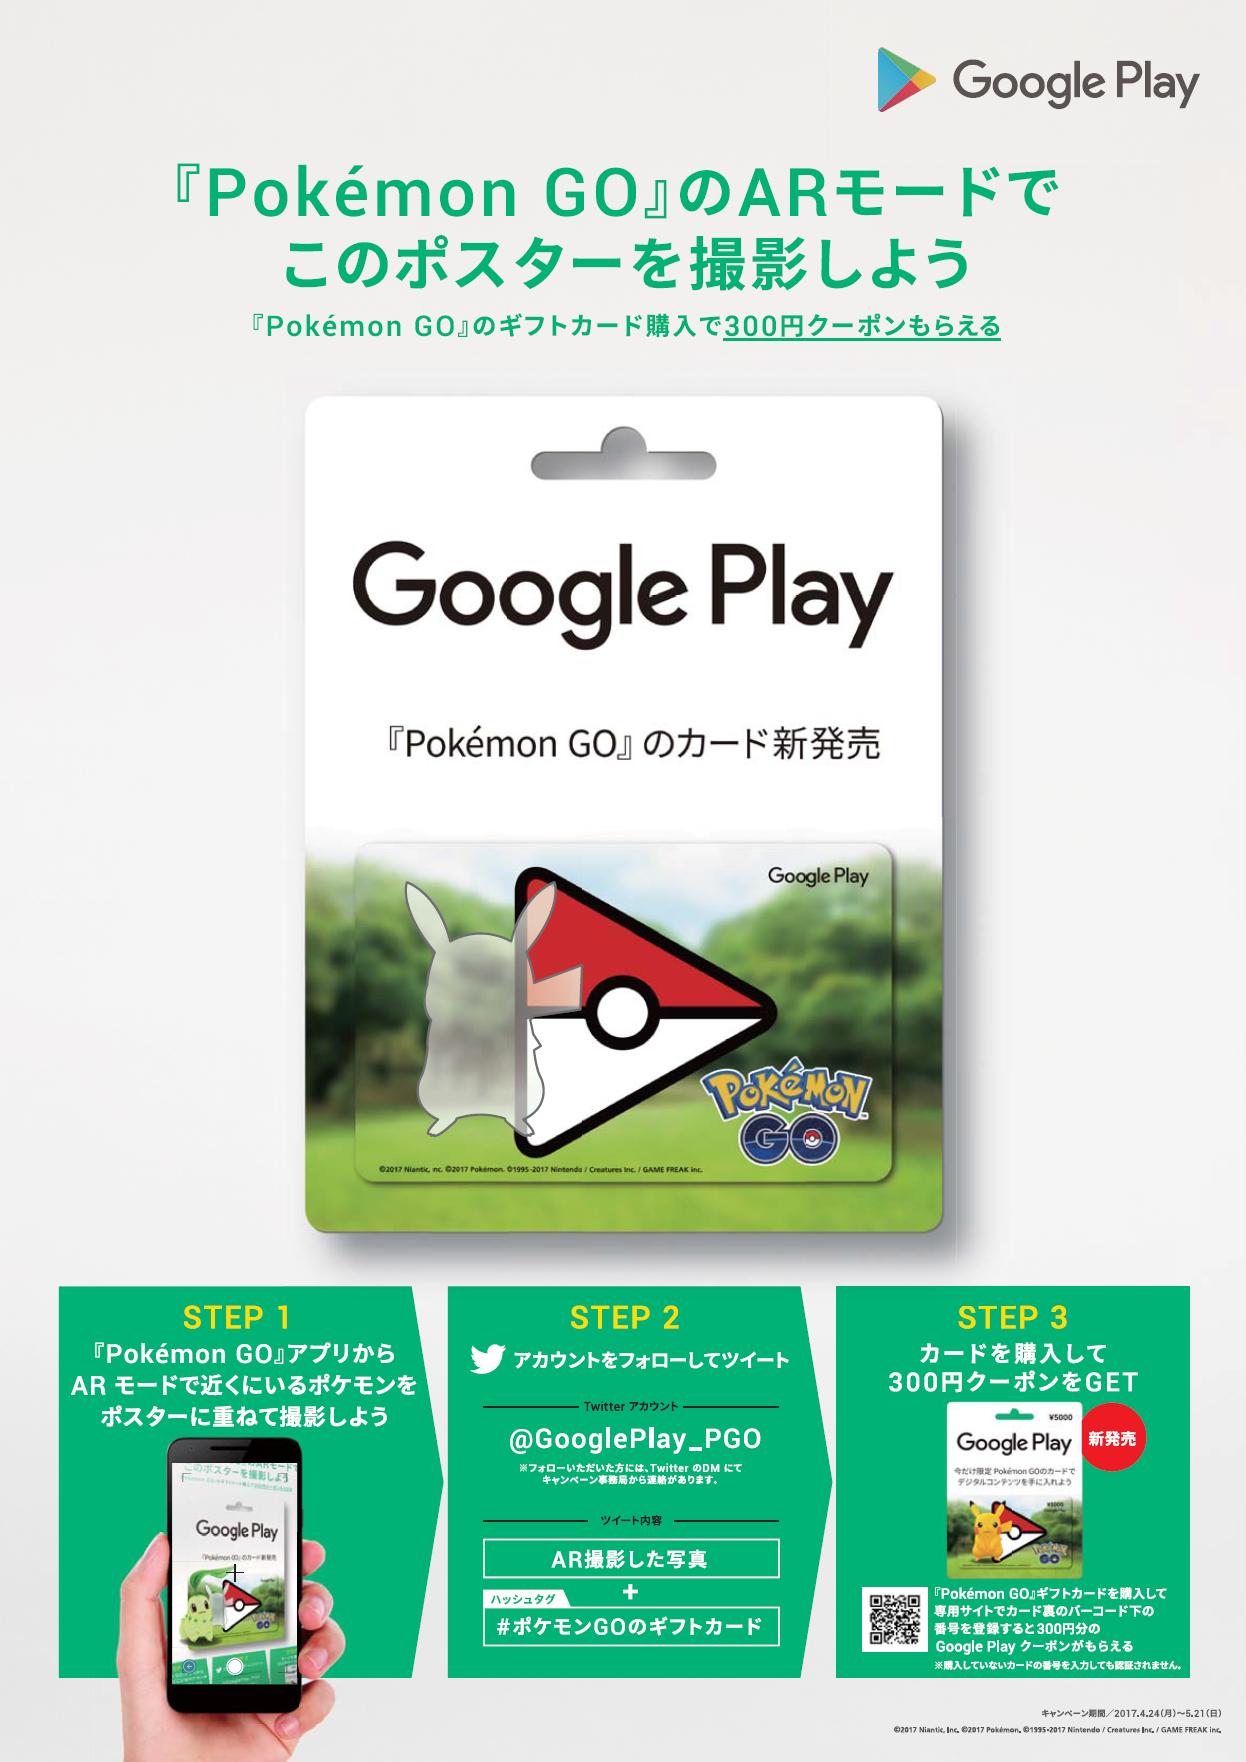 pokémon go』デザインの google play ギフトカードが発売中